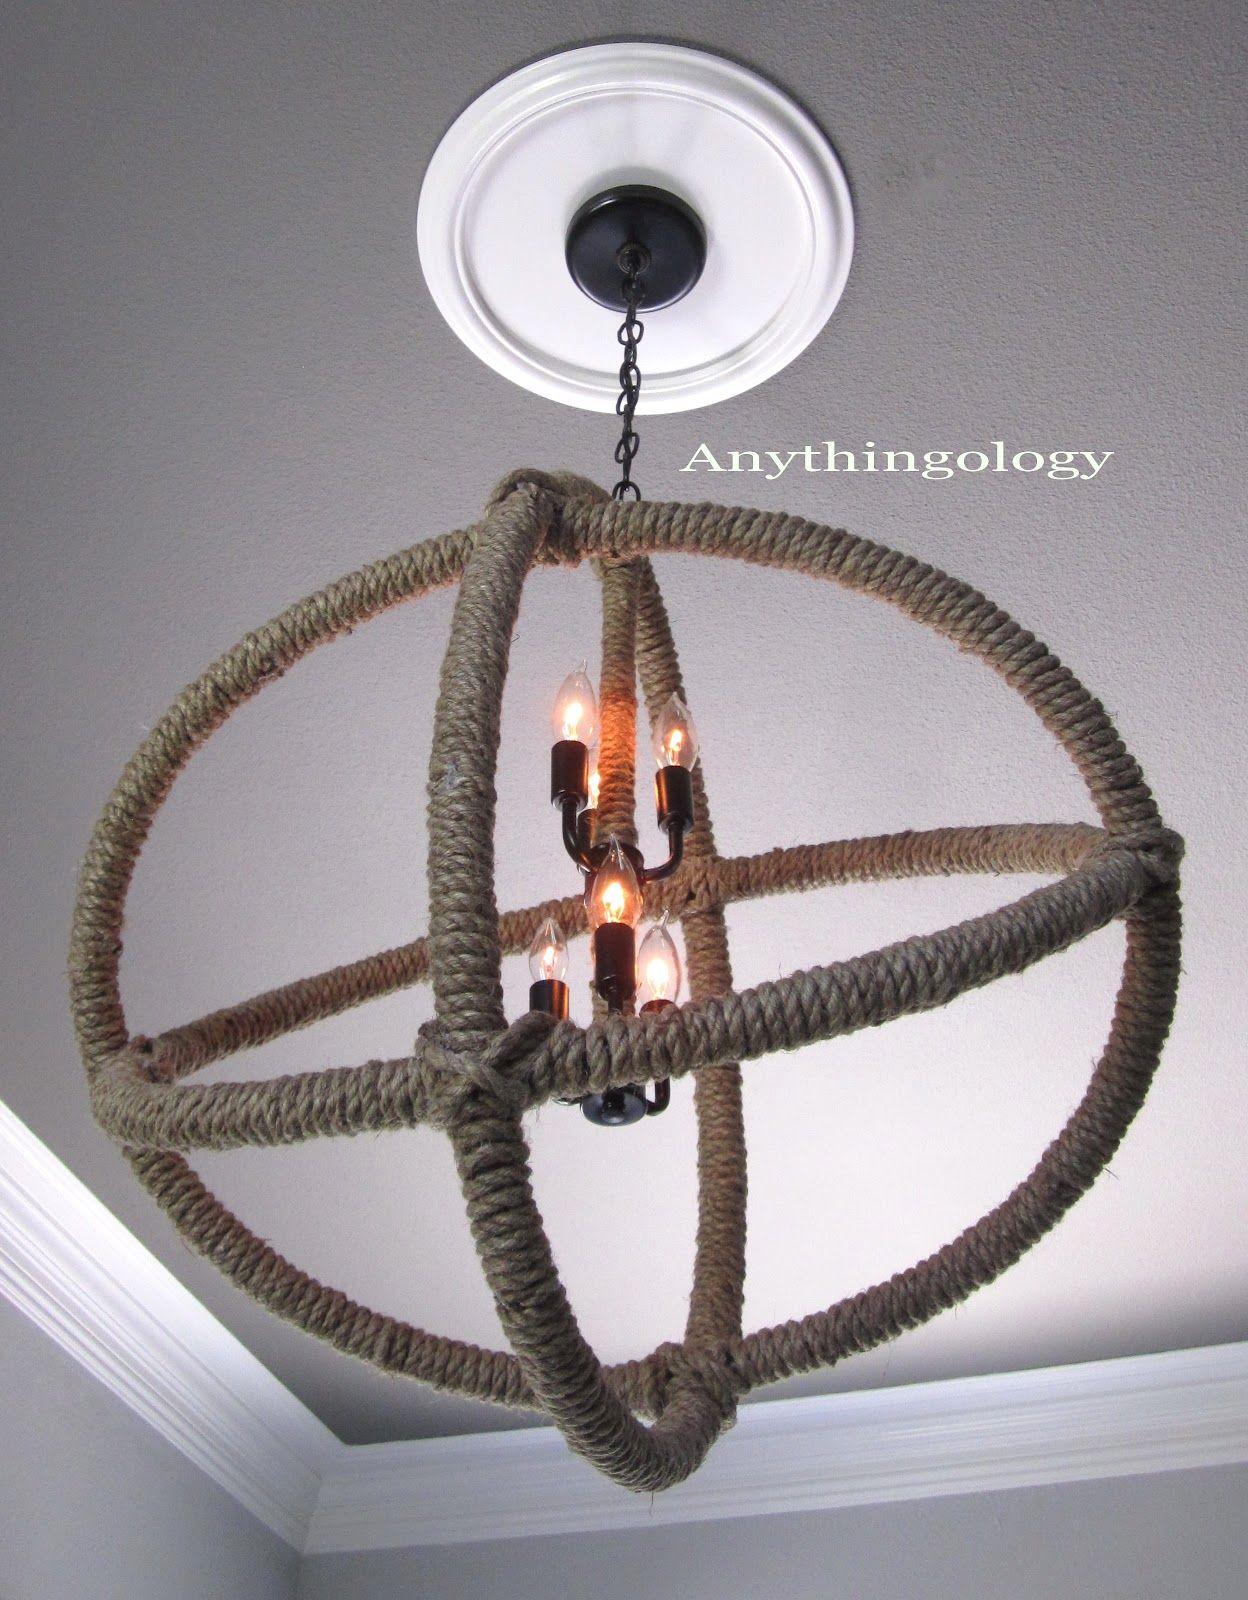 Diy restoration hardware rope planetarium chandelier made with hula